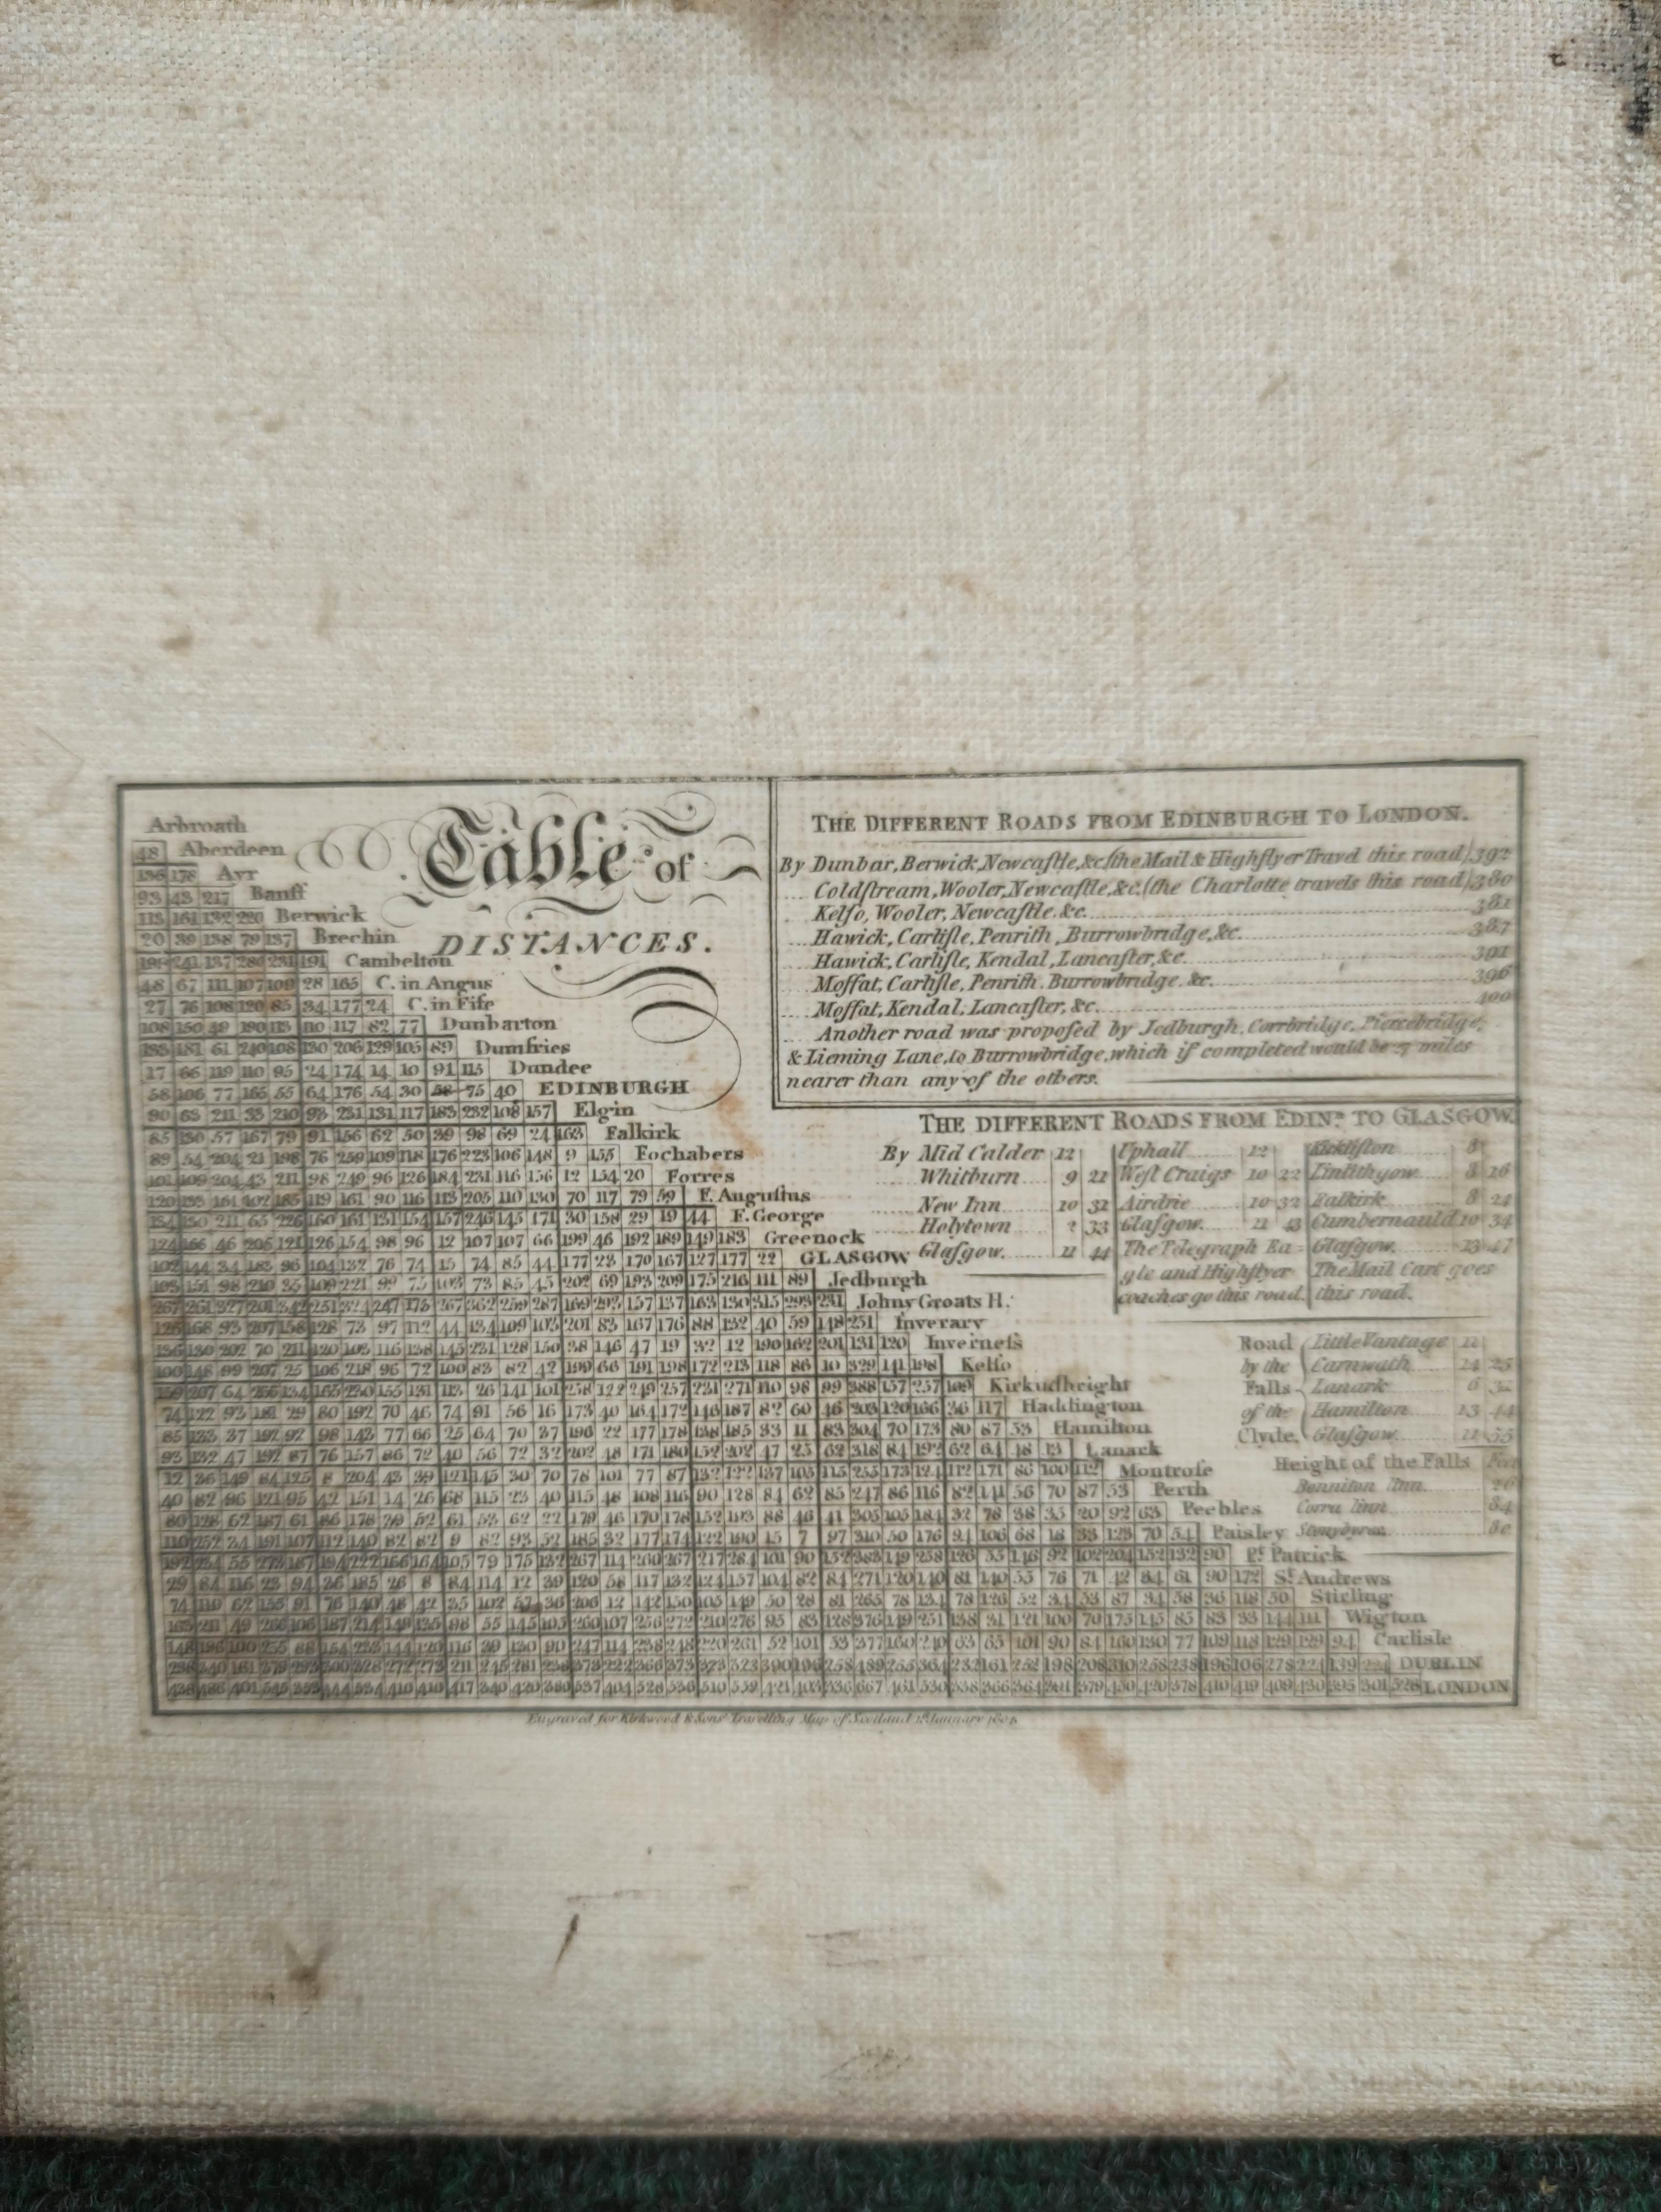 KIRKWOOD J. & SONS.Map of Scotland. Hand col. eng. fldg. linen map in well worn orig. slip case. - Image 10 of 36